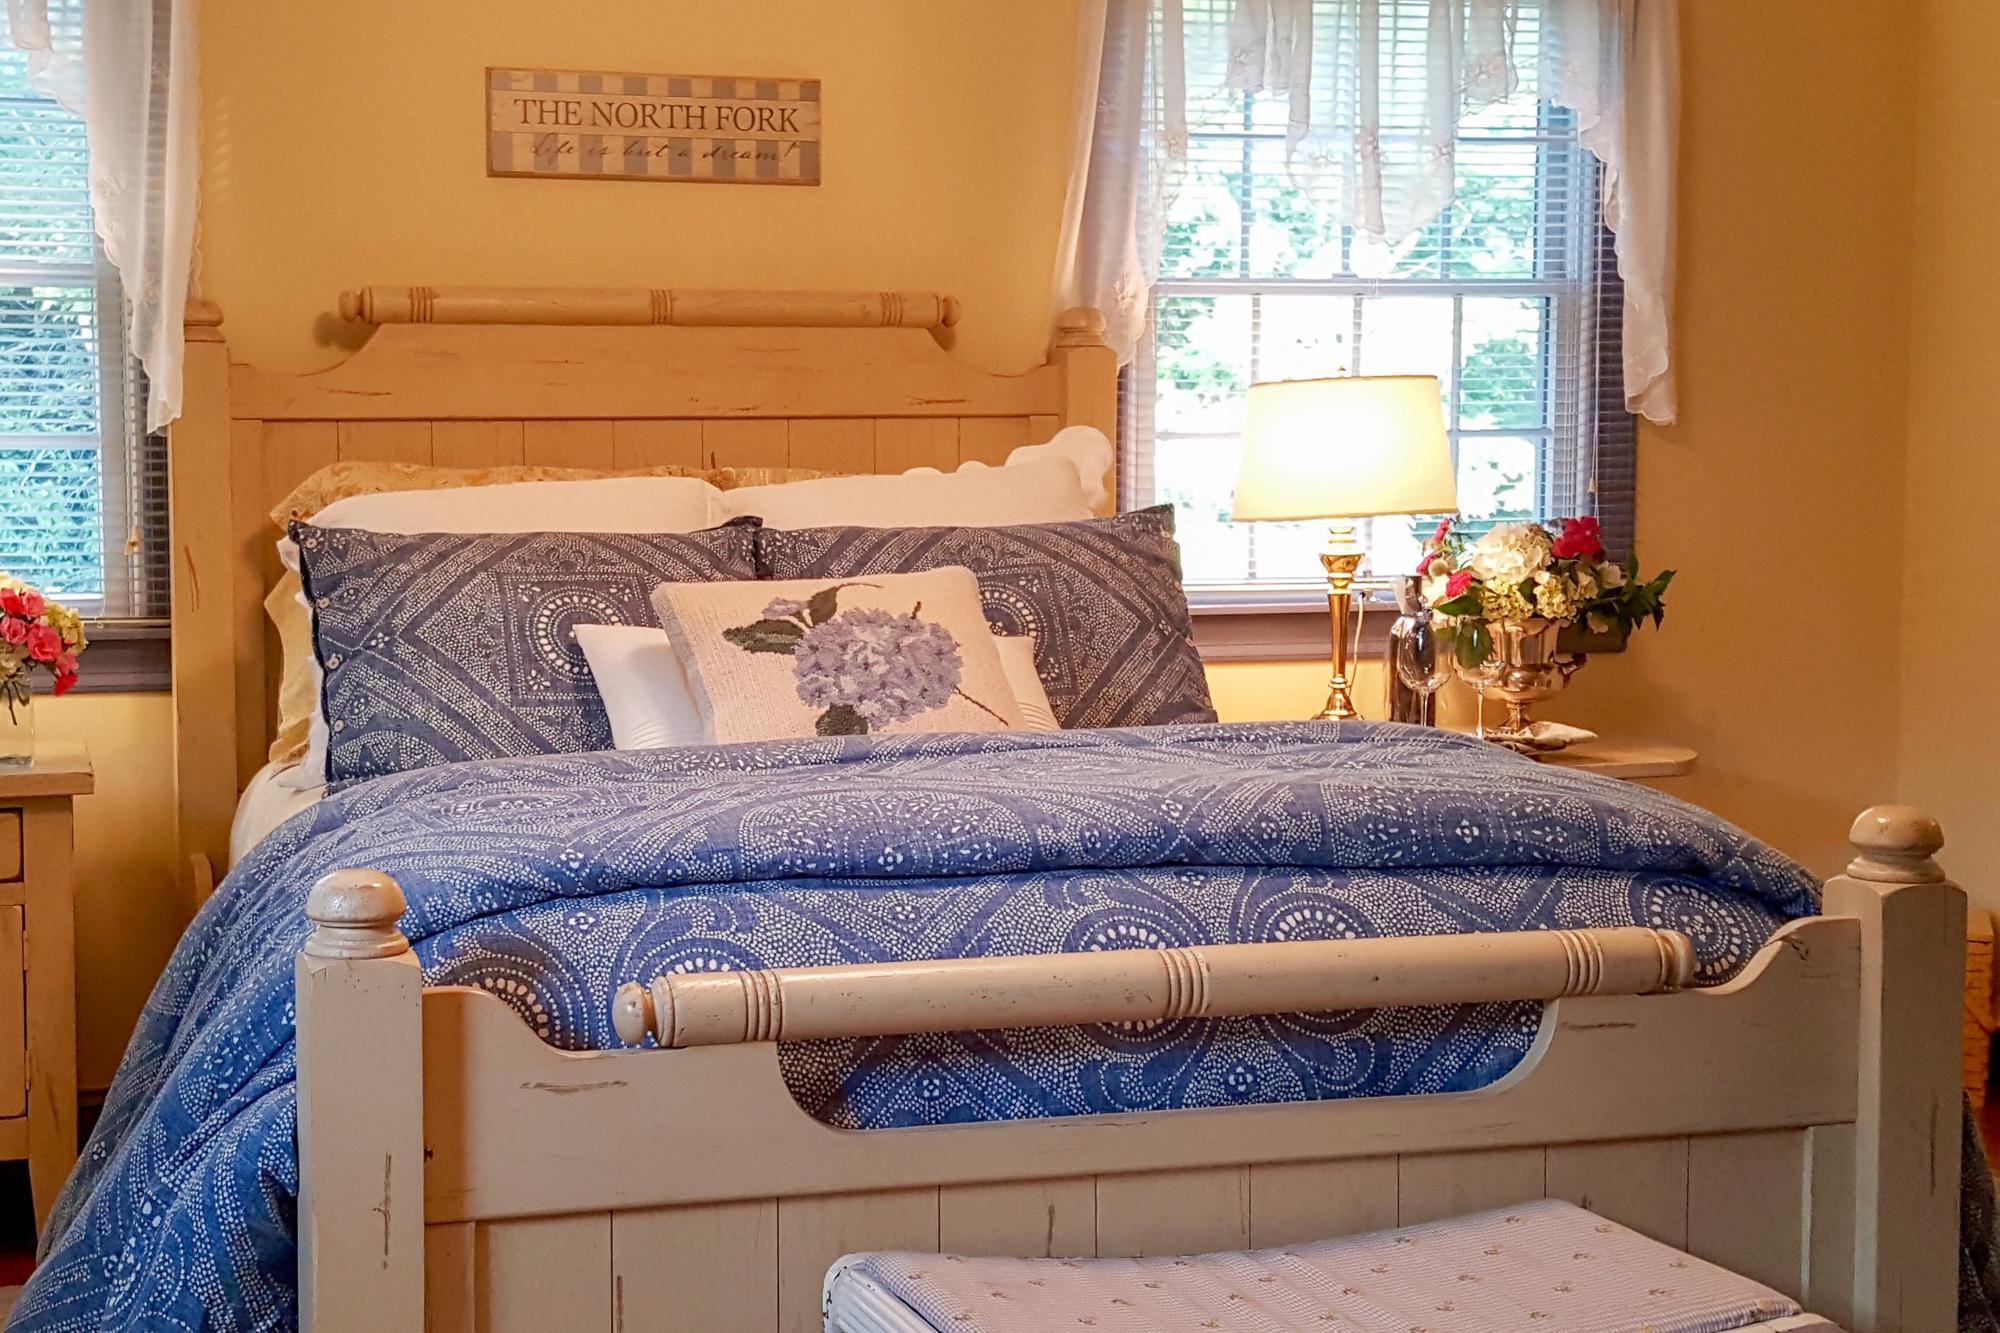 Hydrangea bed copy.jpg